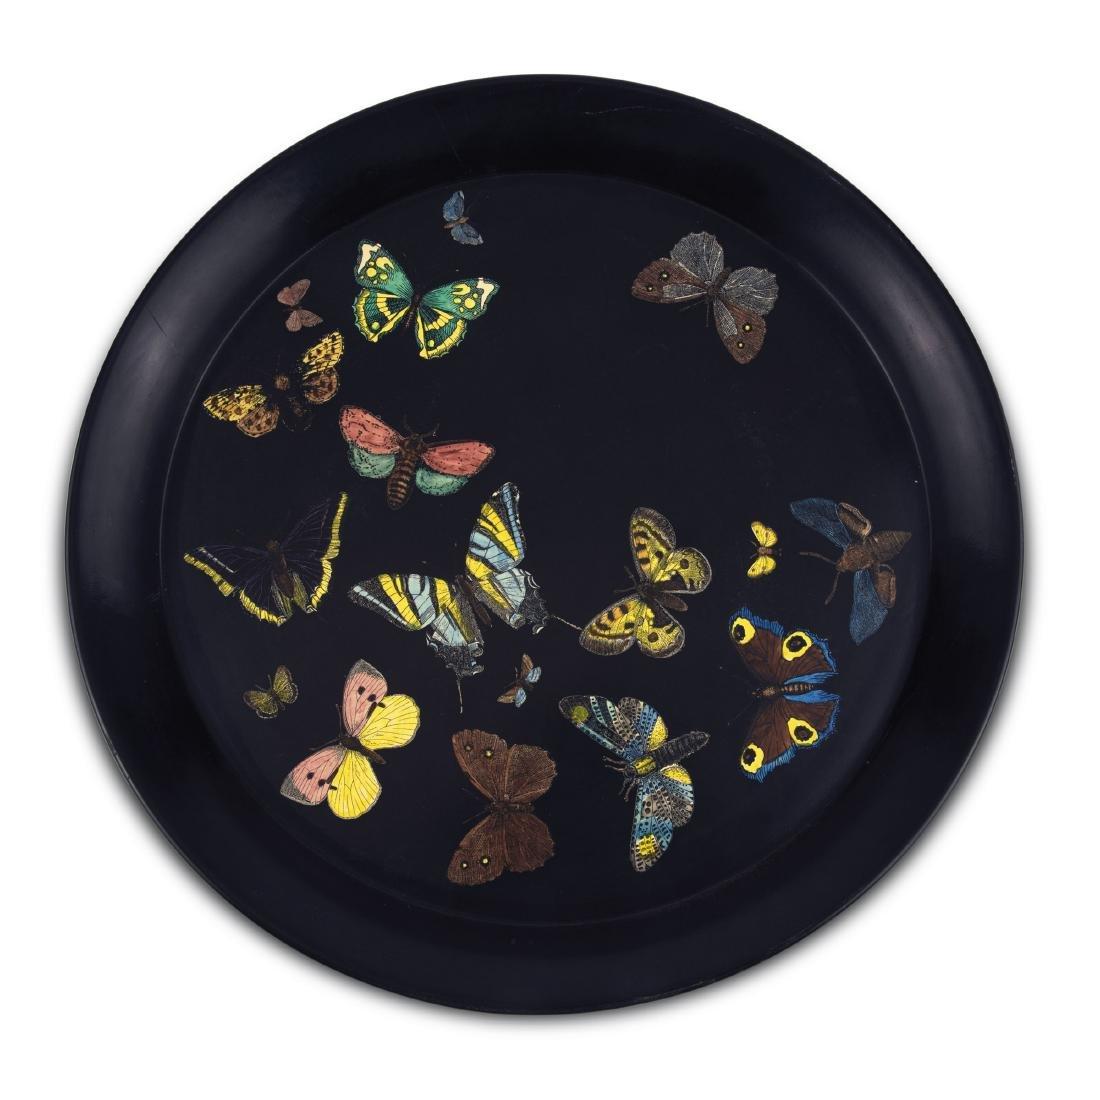 'Farfalle nero' tray, 1950/60s